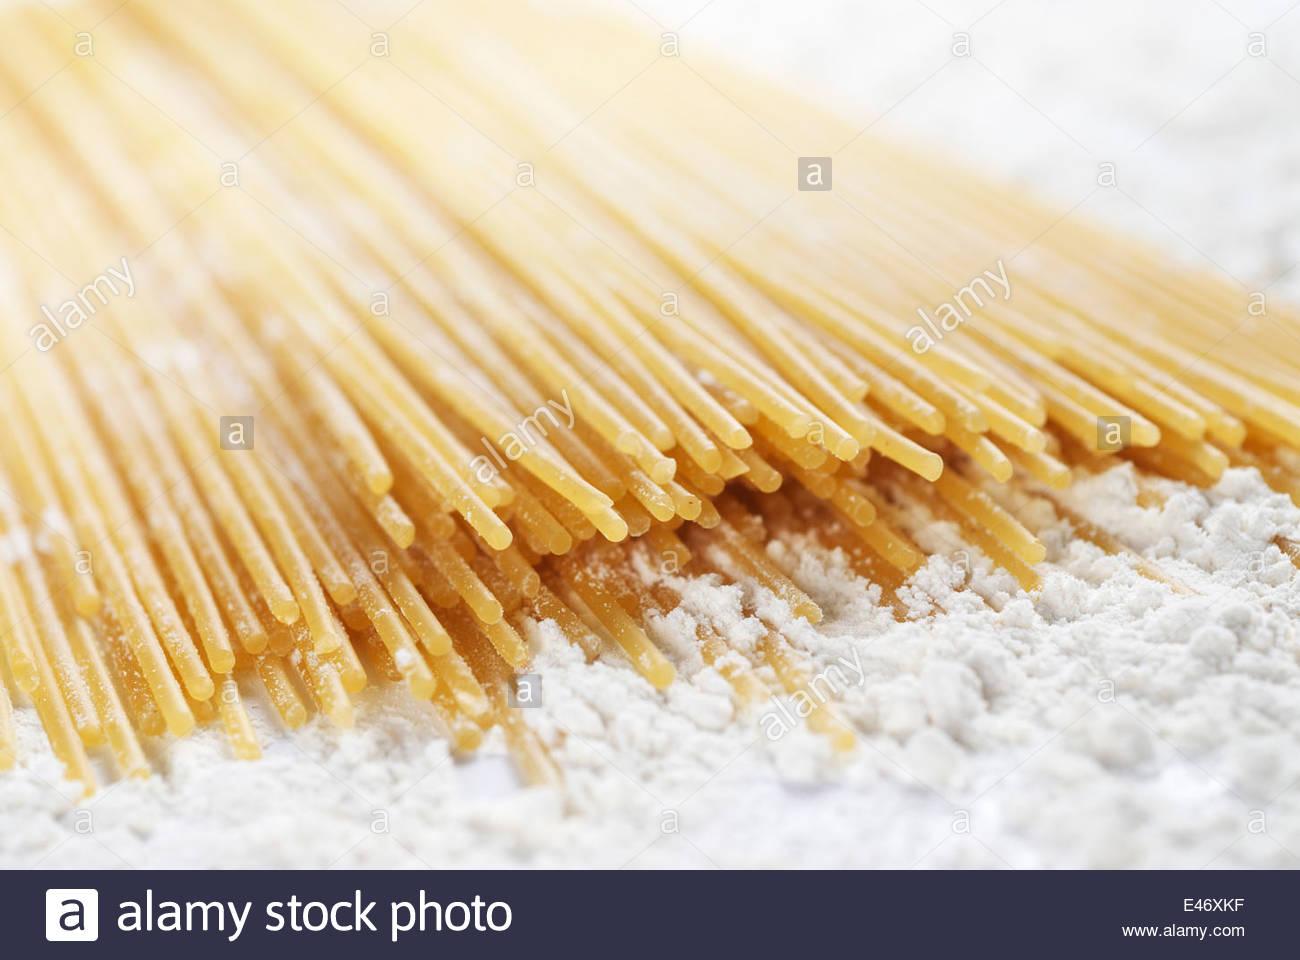 Closeup of raw spaghetti pasta with flour - Stock Image